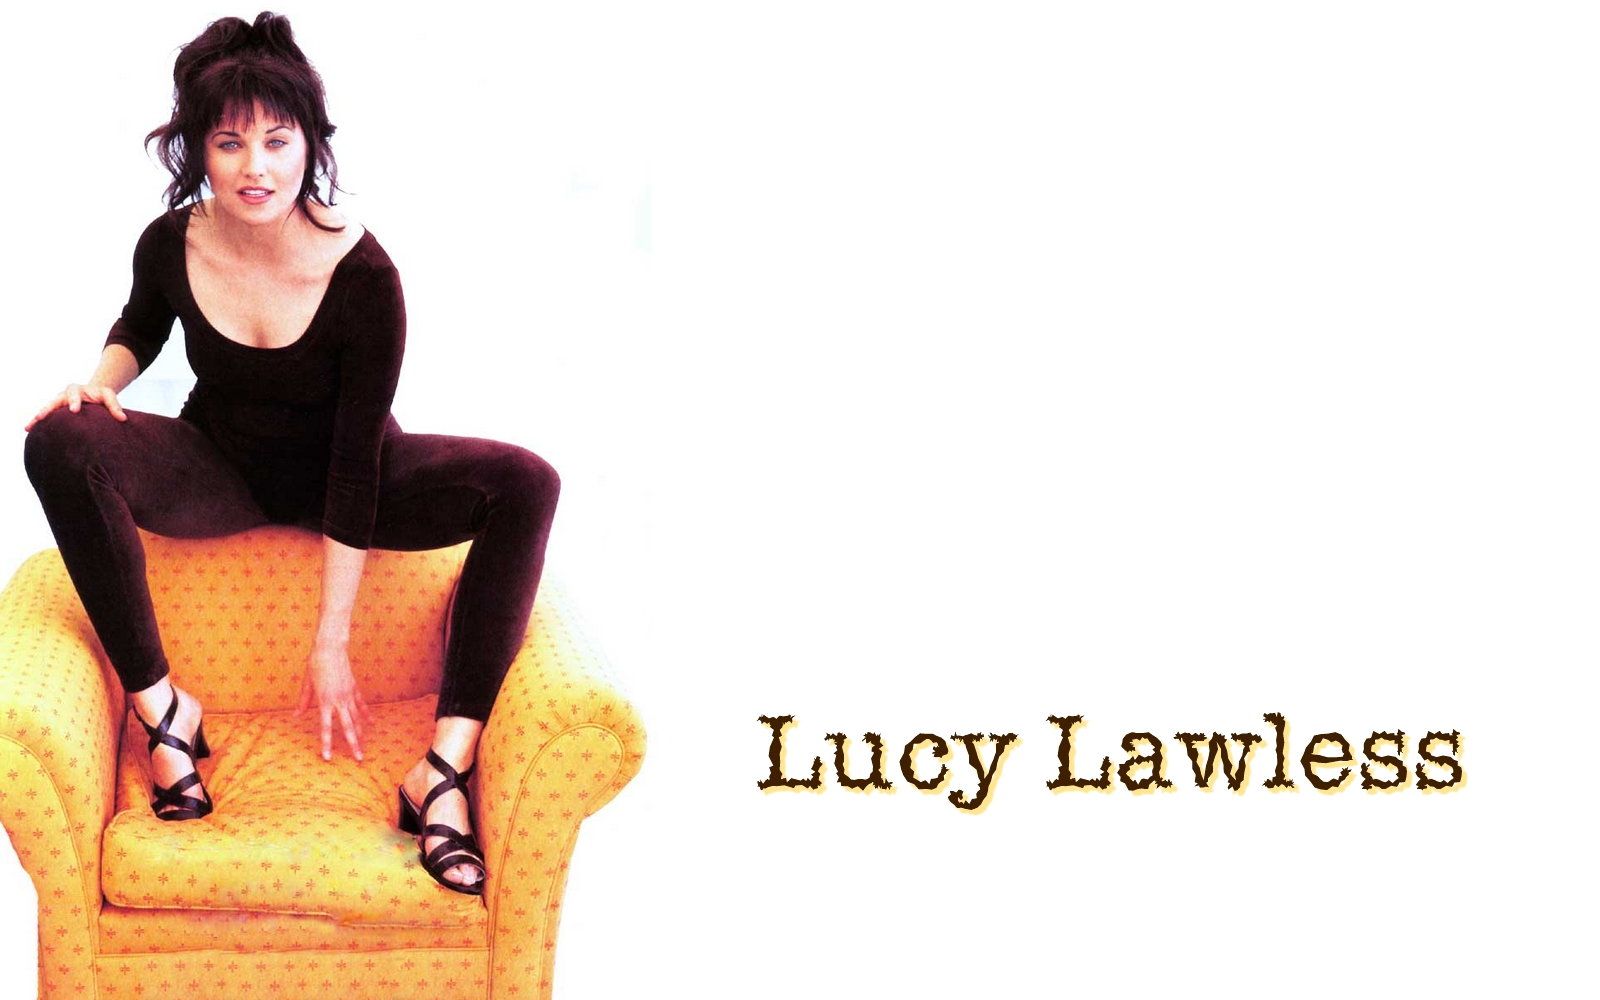 http://1.bp.blogspot.com/-baLxjQvNwug/UFtOUwGMjDI/AAAAAAAGCkU/xBiLipFrJNQ/s1600/Lucy%2BLawless%2BWallpaper%2B10.jpg